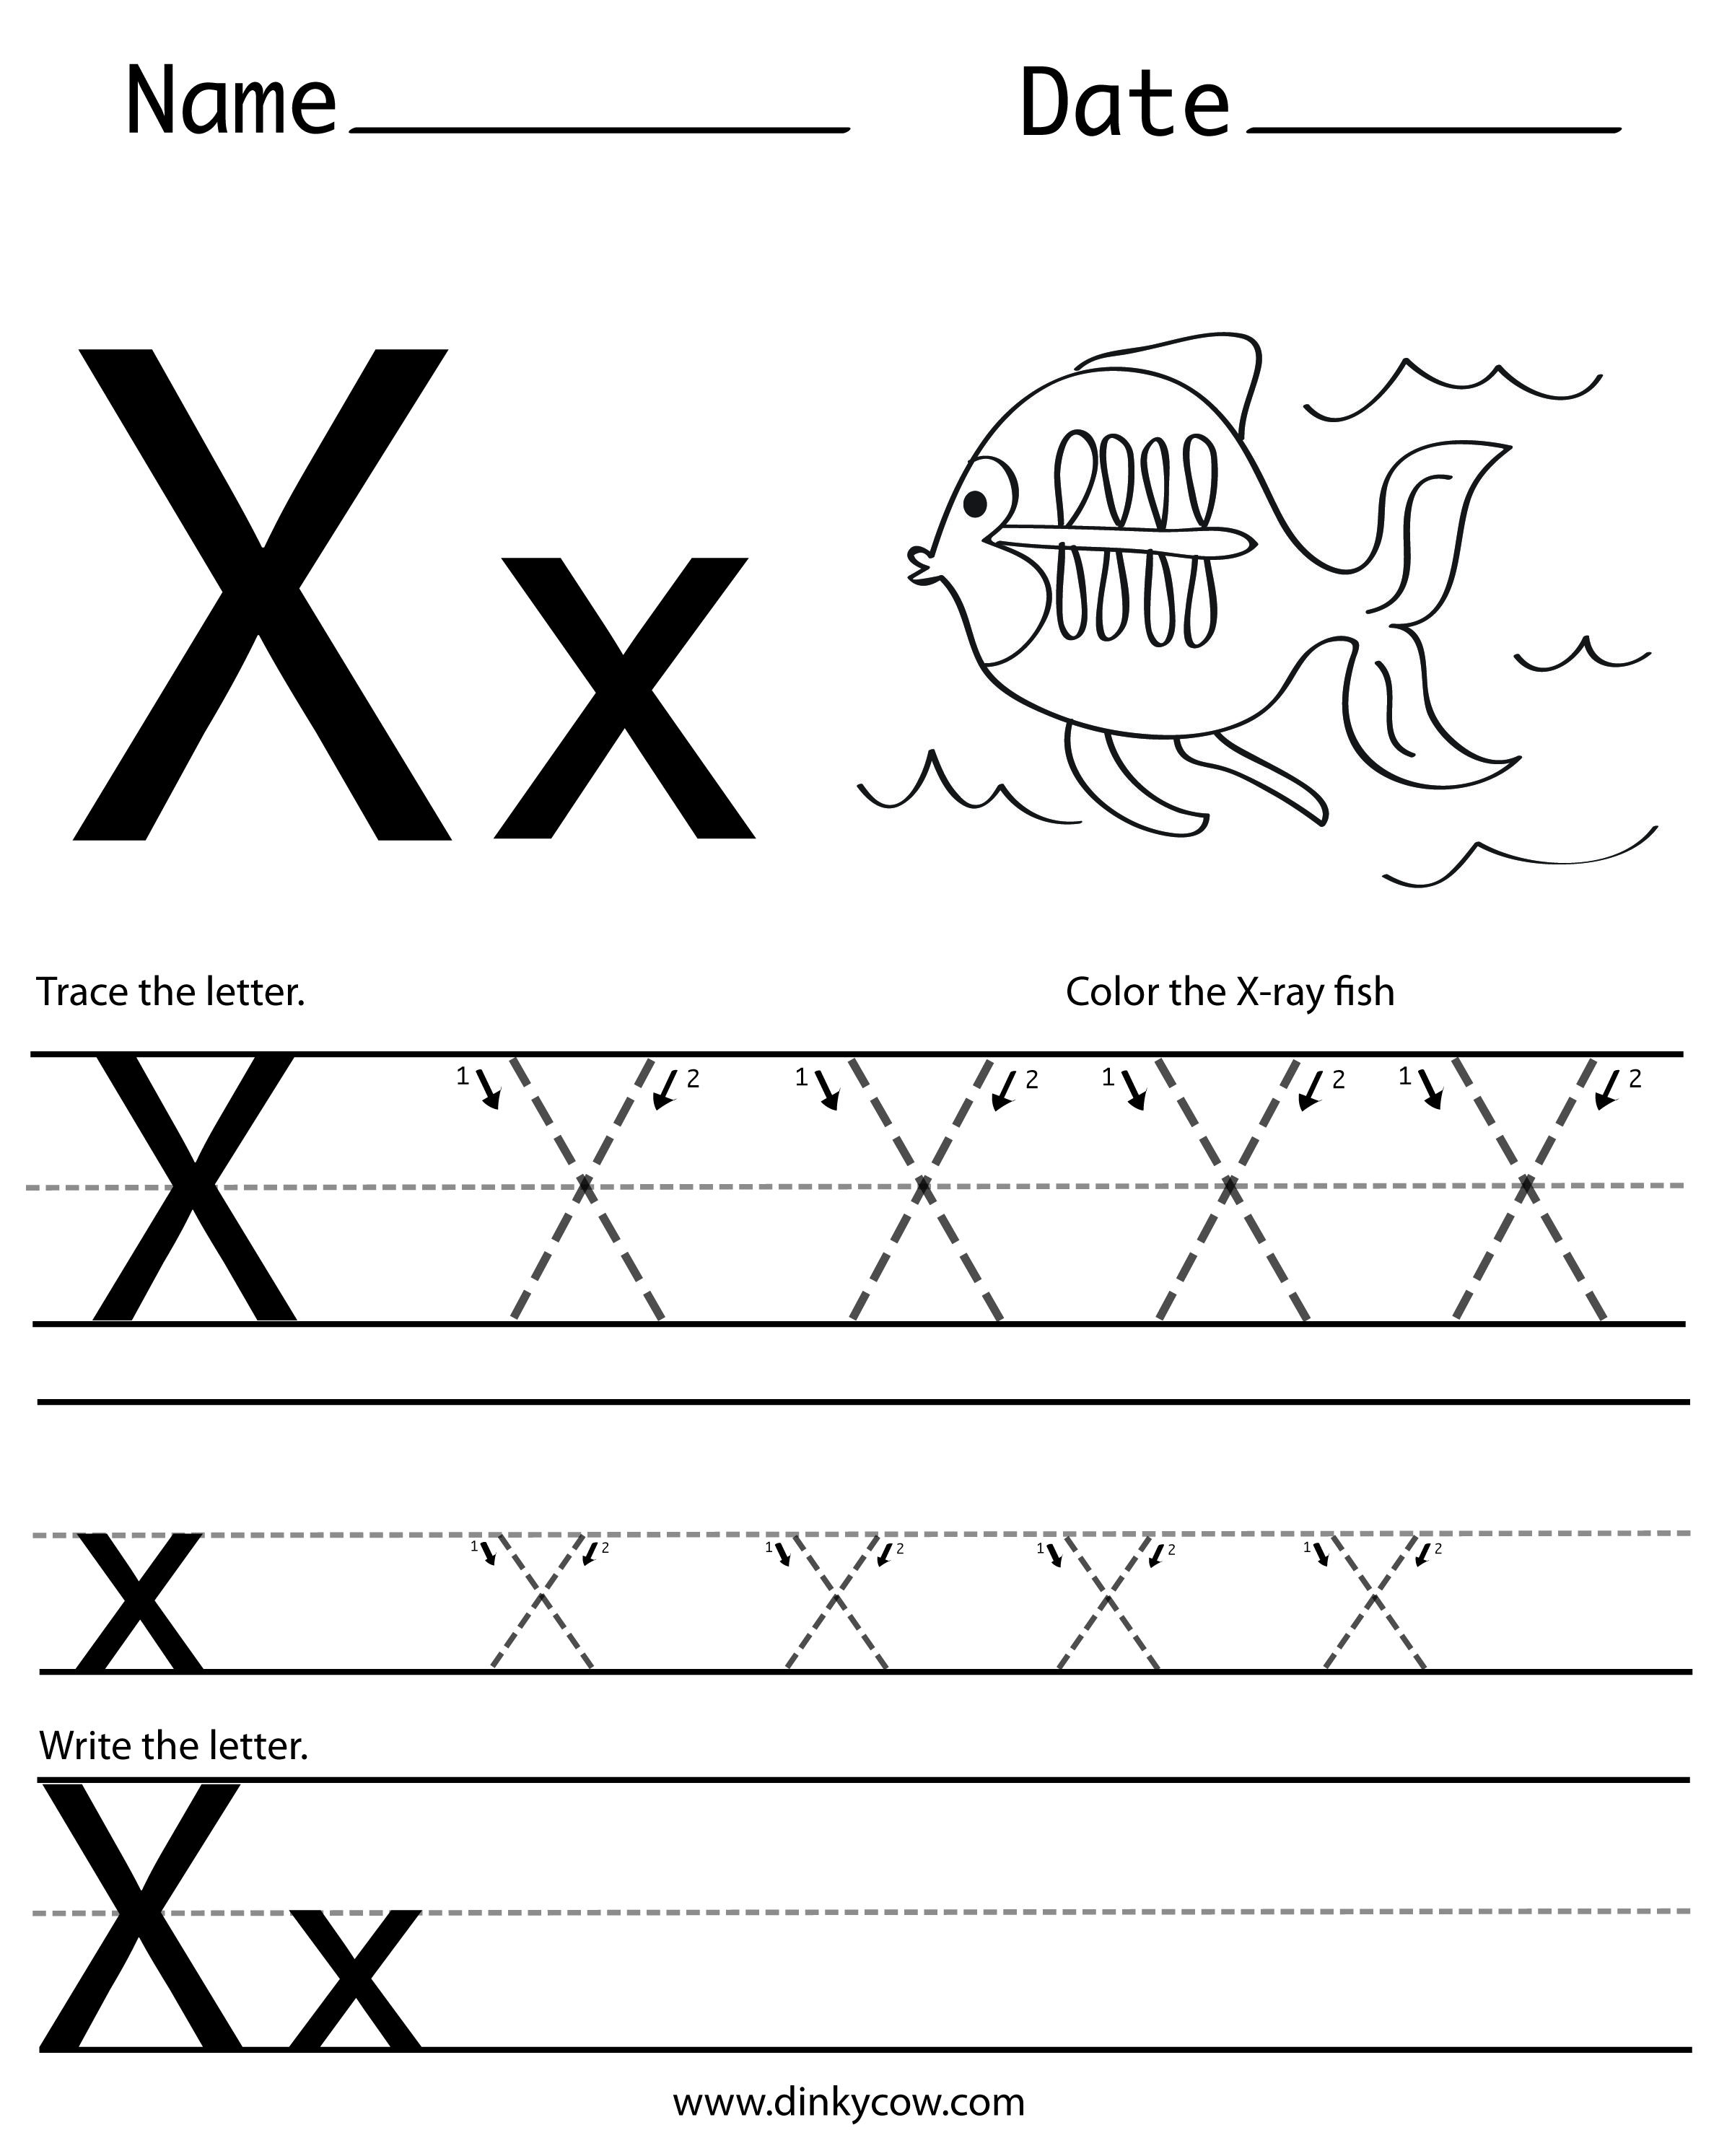 X Free Handwriting Worksheet Print 2 400 2 988 Pixels